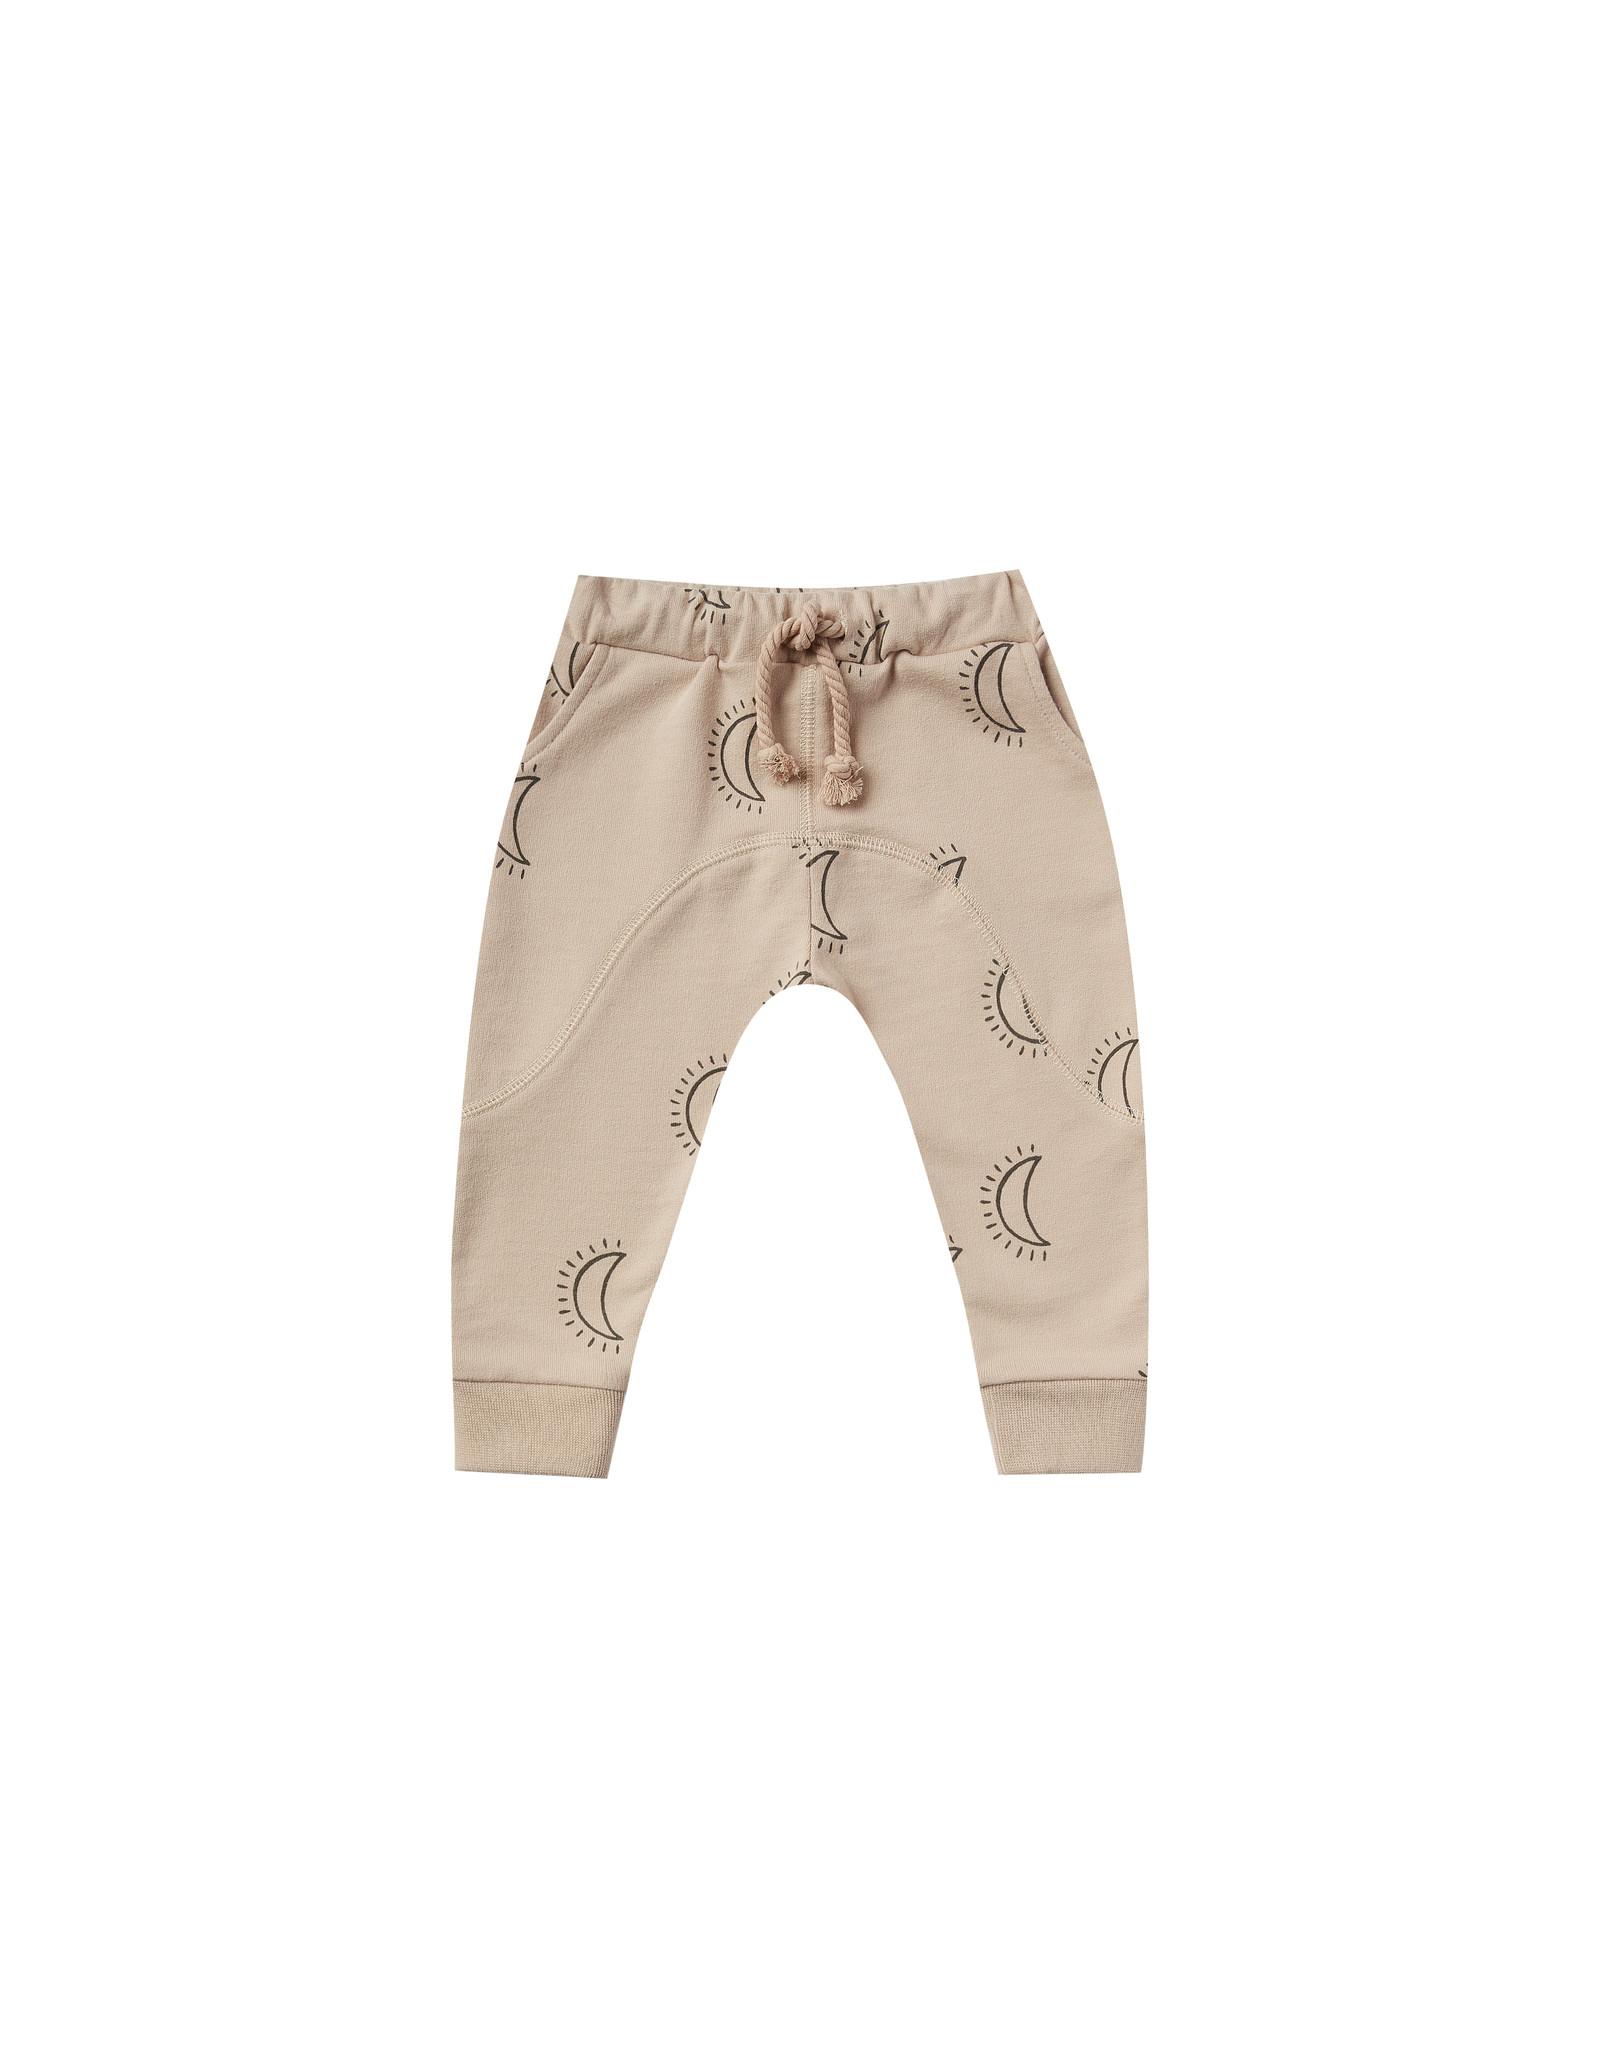 Rylee + Cru Infant Oat Moons Print Knit Pant